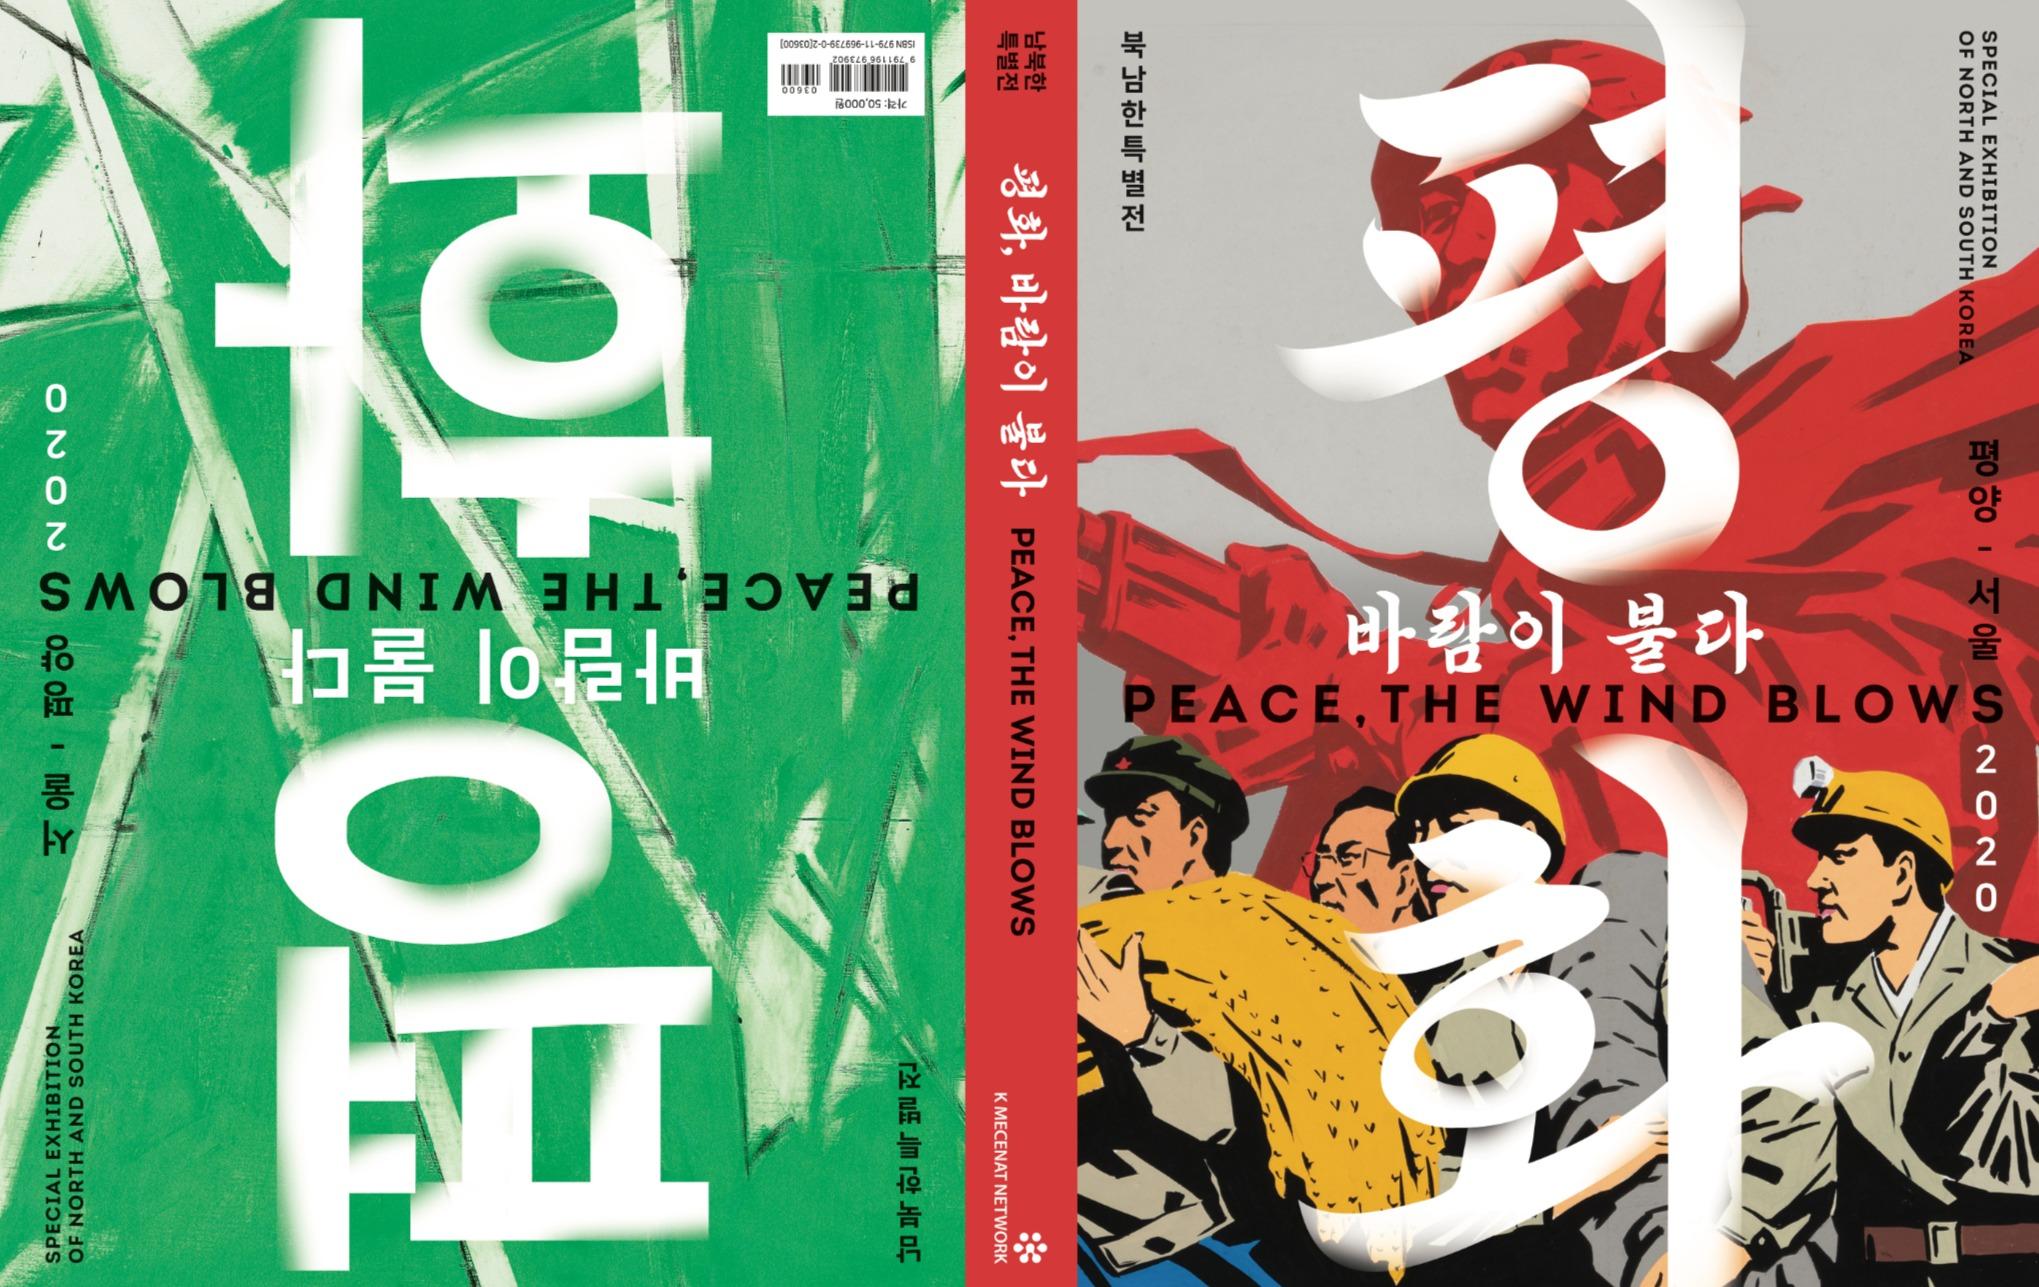 [Group Exhibition] 2020 '평화, 바람이 불다', 오두산 통일전망대 전시관, 파주